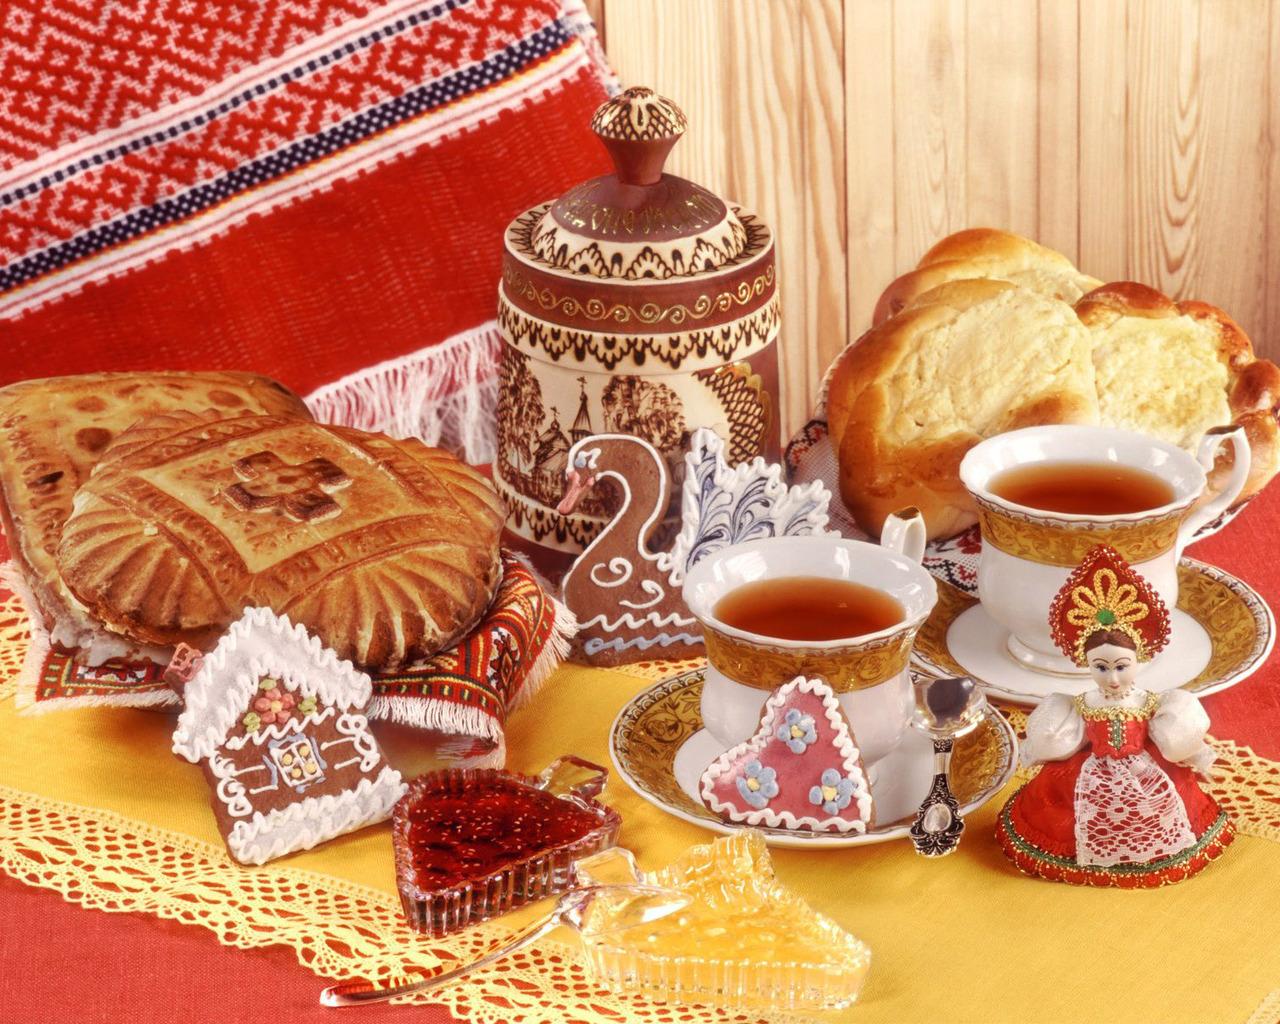 http://www.wallpage.ru/imgbig/wallpapers_49670.jpg